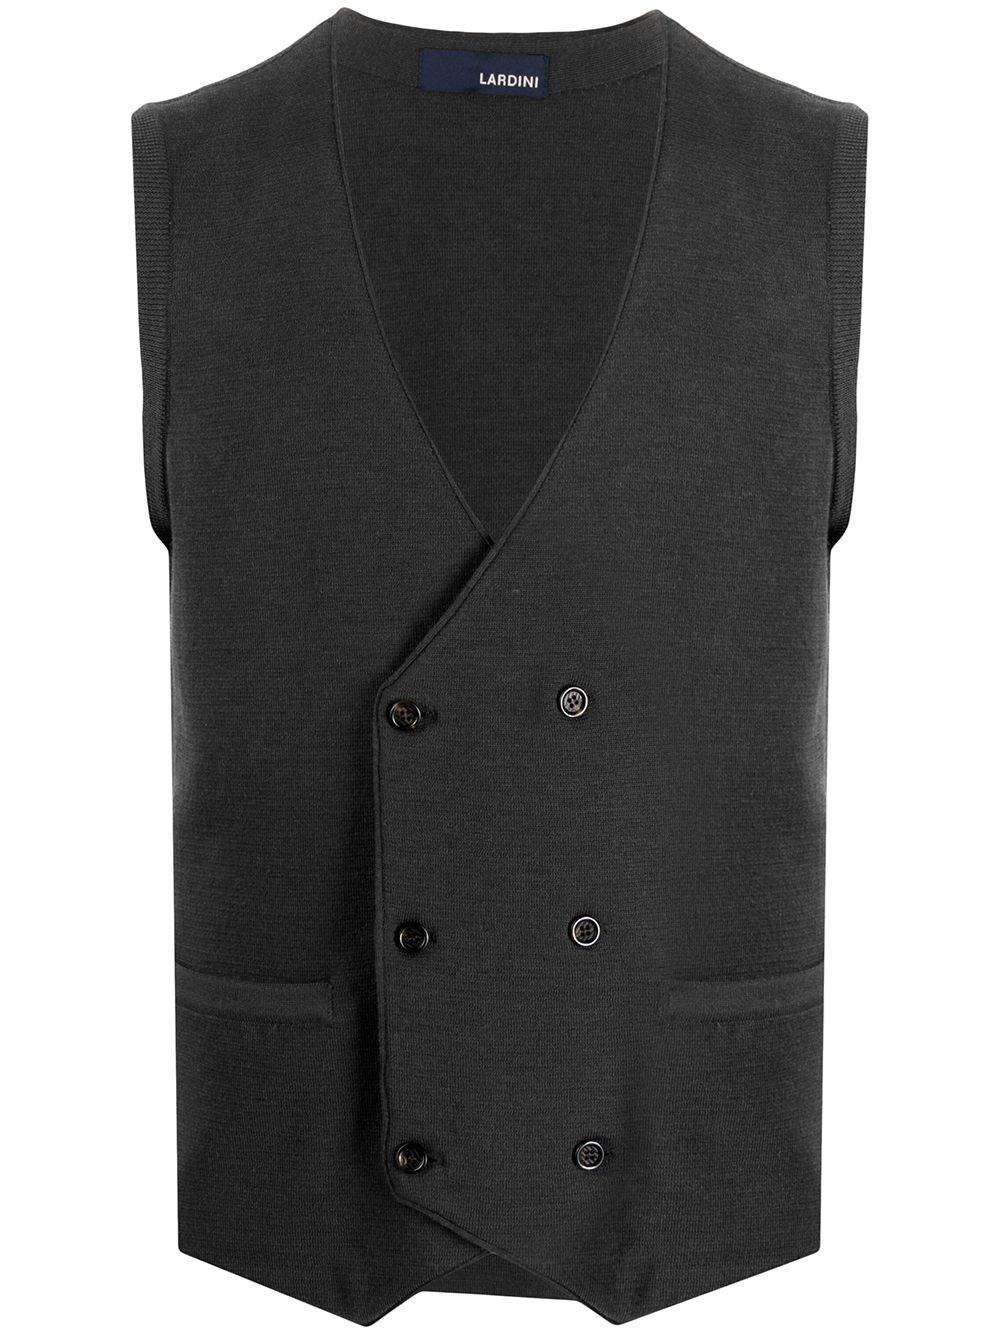 LARDINI Double-Breasted Knit Vest